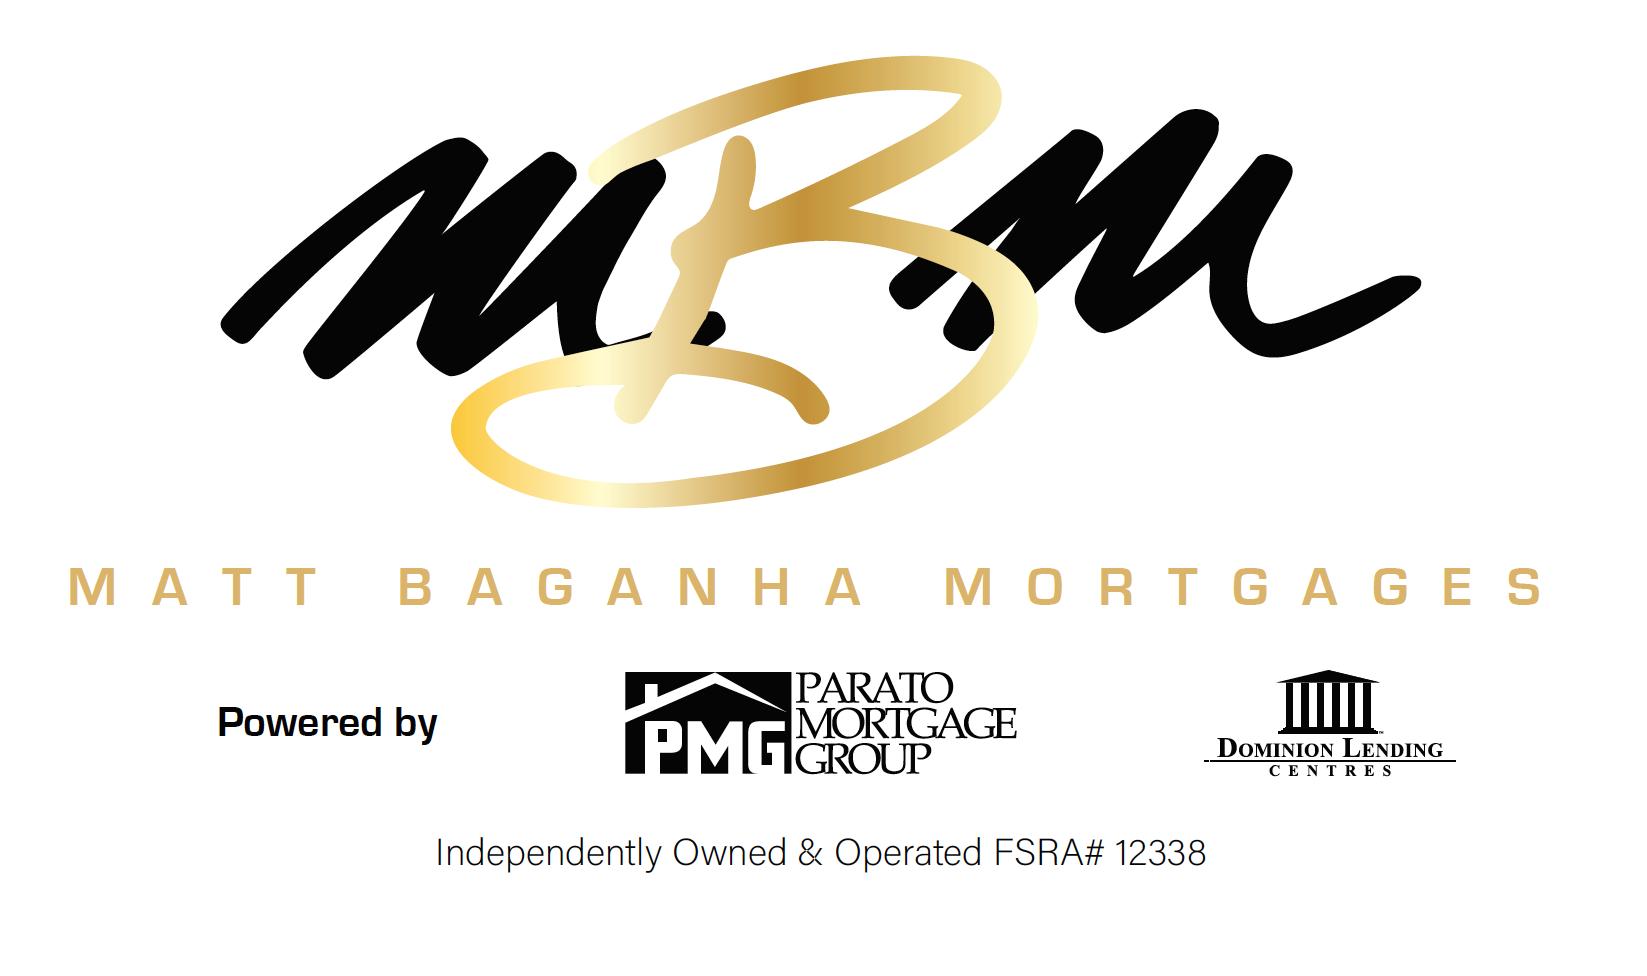 Matt Baganha Mortgages - Mortgage Agent Strathroy - DLC Parato Mortgage Group